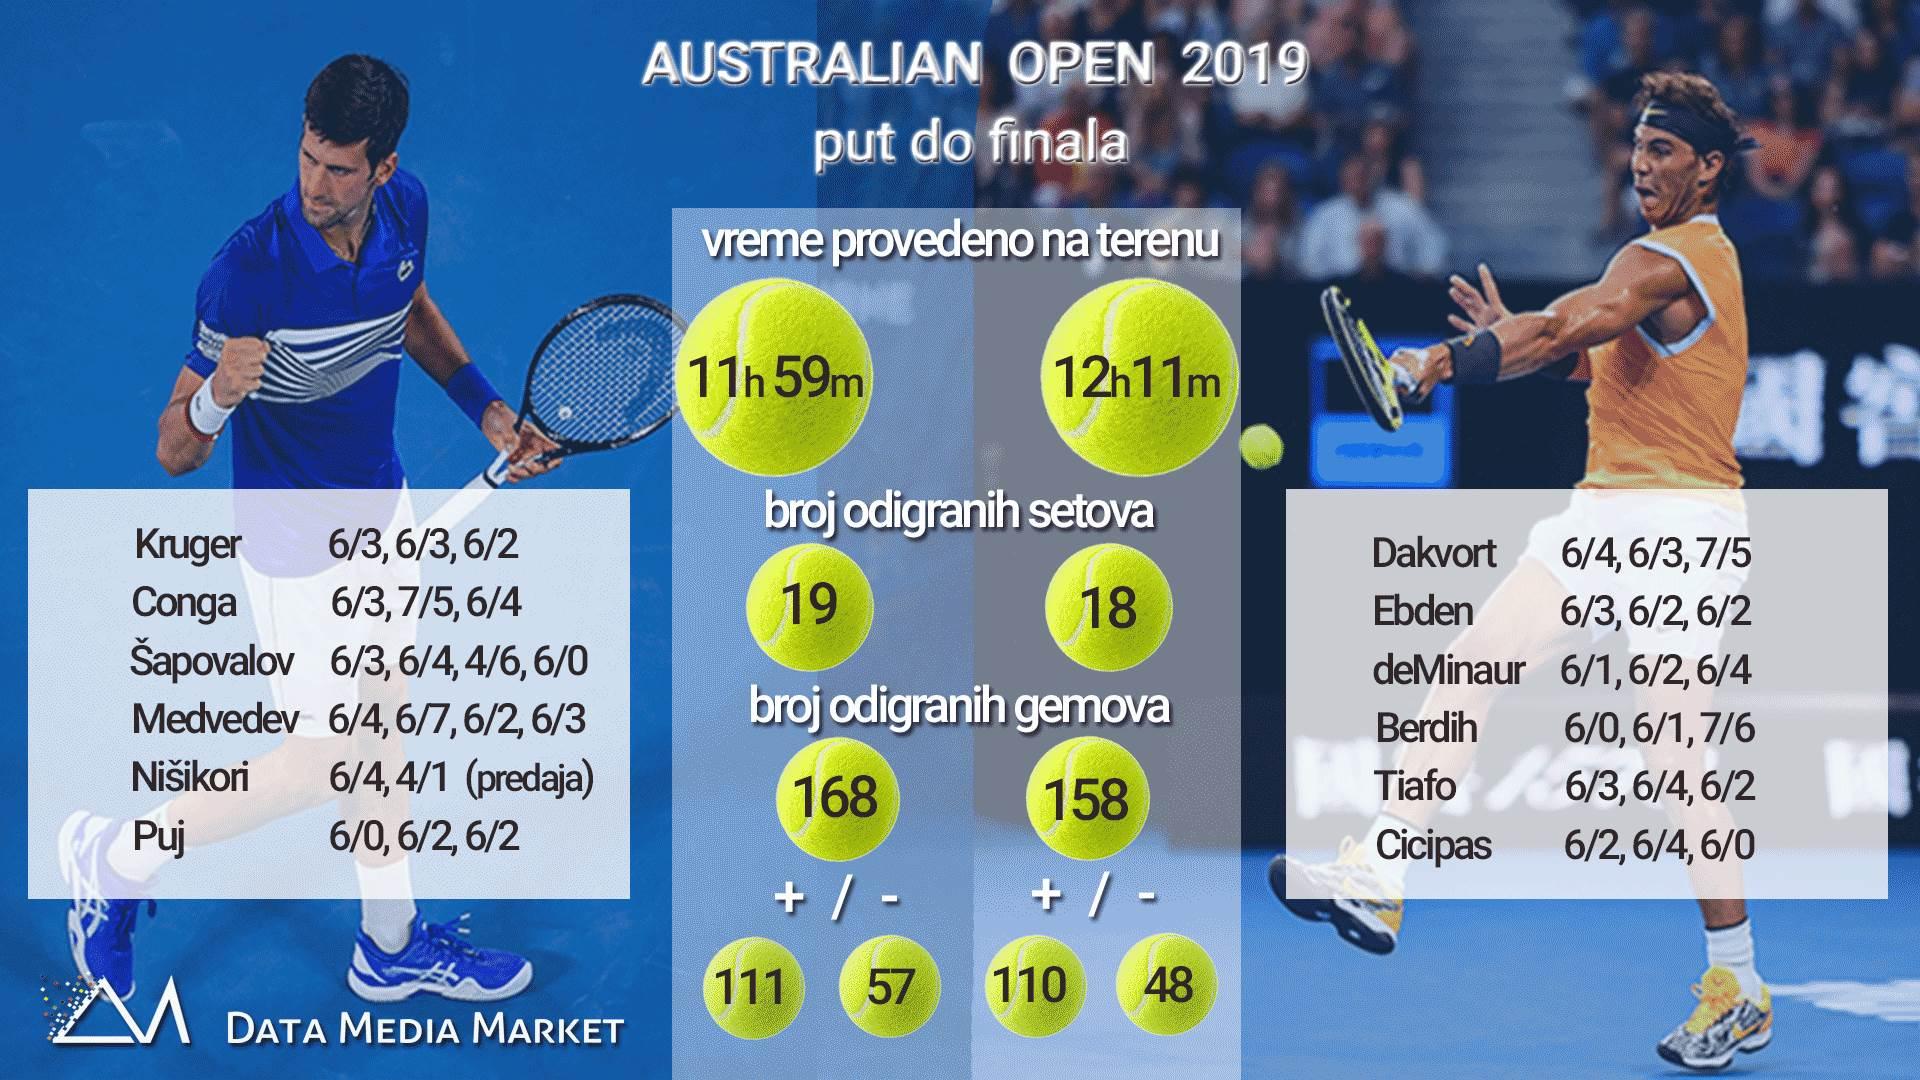 australijan open, Novak Đoković, Rafael Nadal